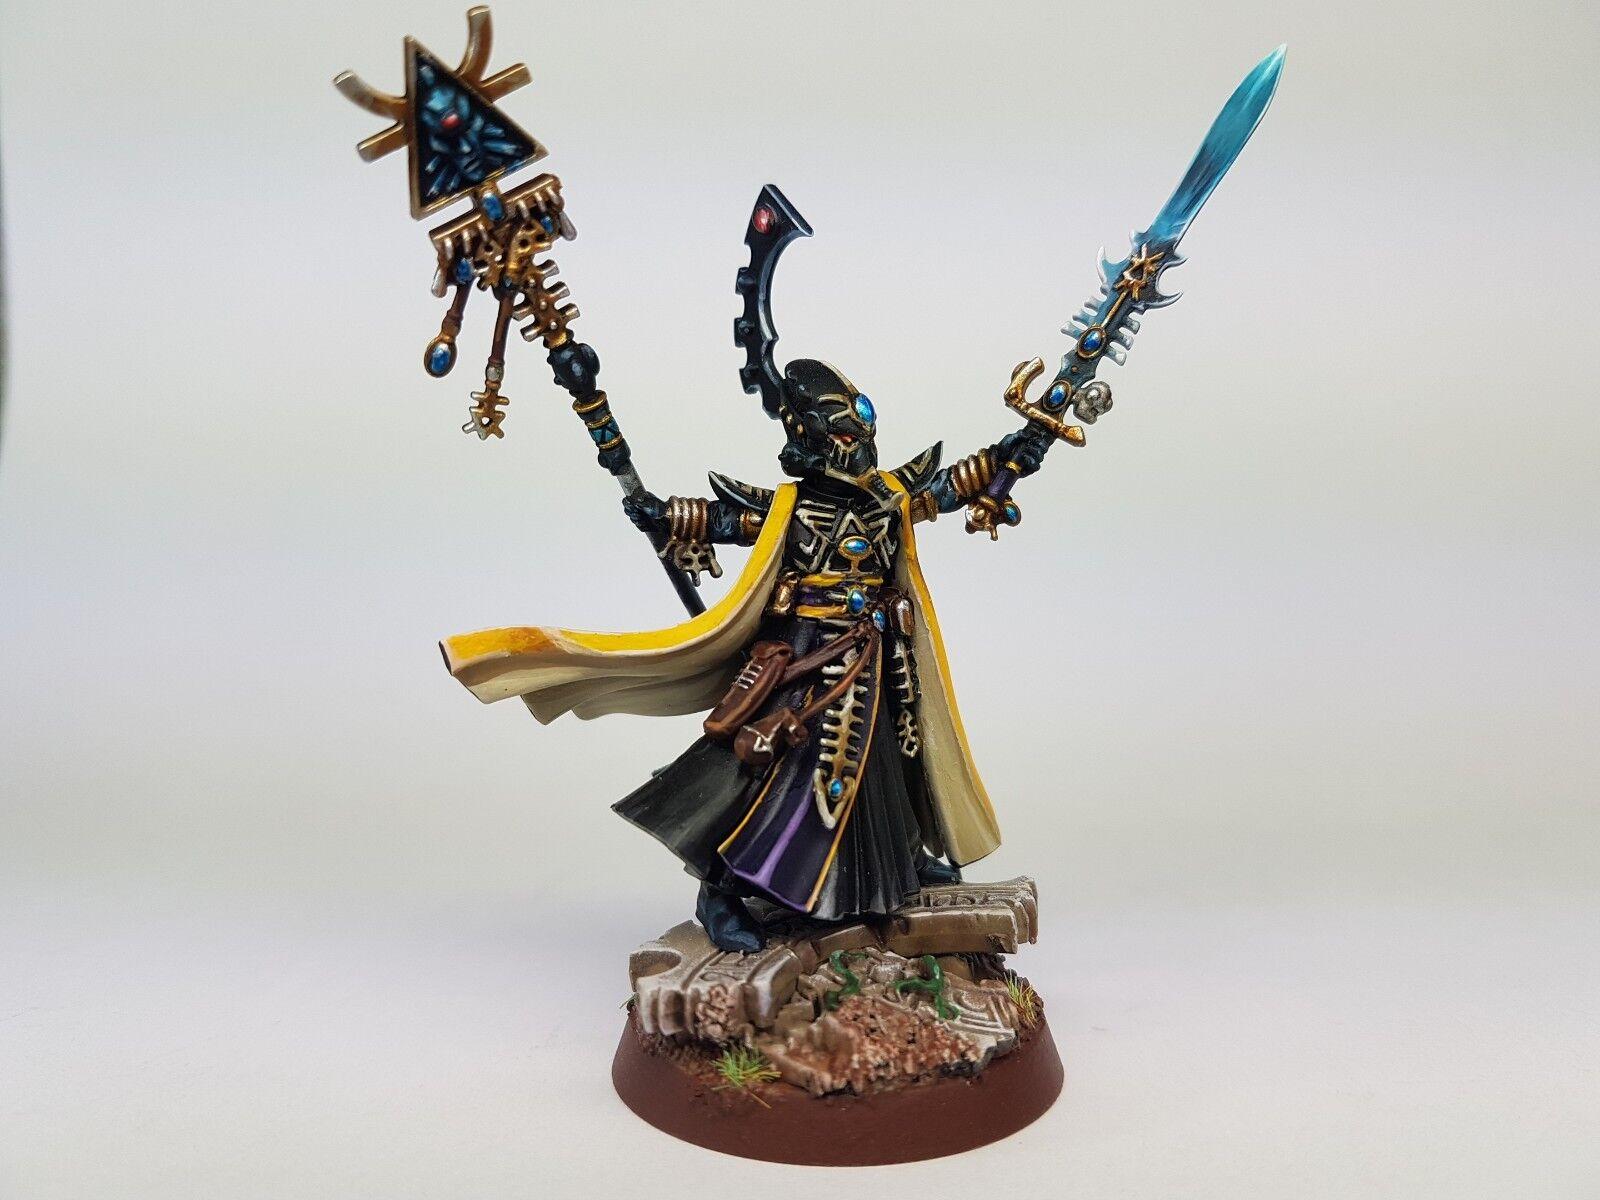 Warhammer 40K Eldar-Phoenix Lord Eldrad ulthran  Commission pour comhommeder  offre spéciale